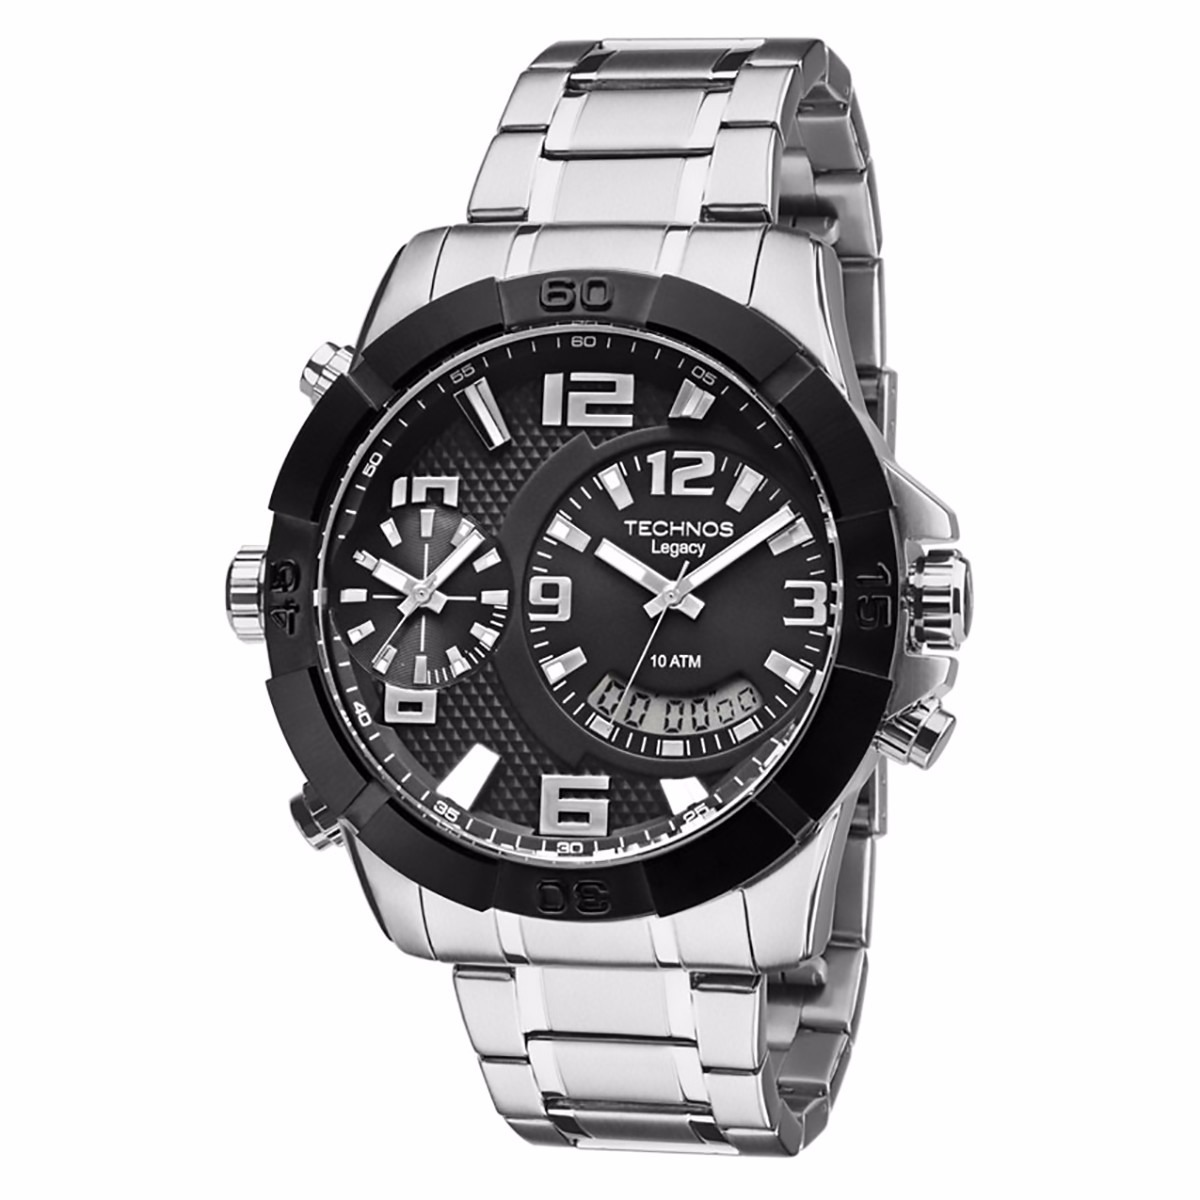 b04ad0345ca Relógio Technos Masculino Legacy Dual Time T205fk 3p - R  579